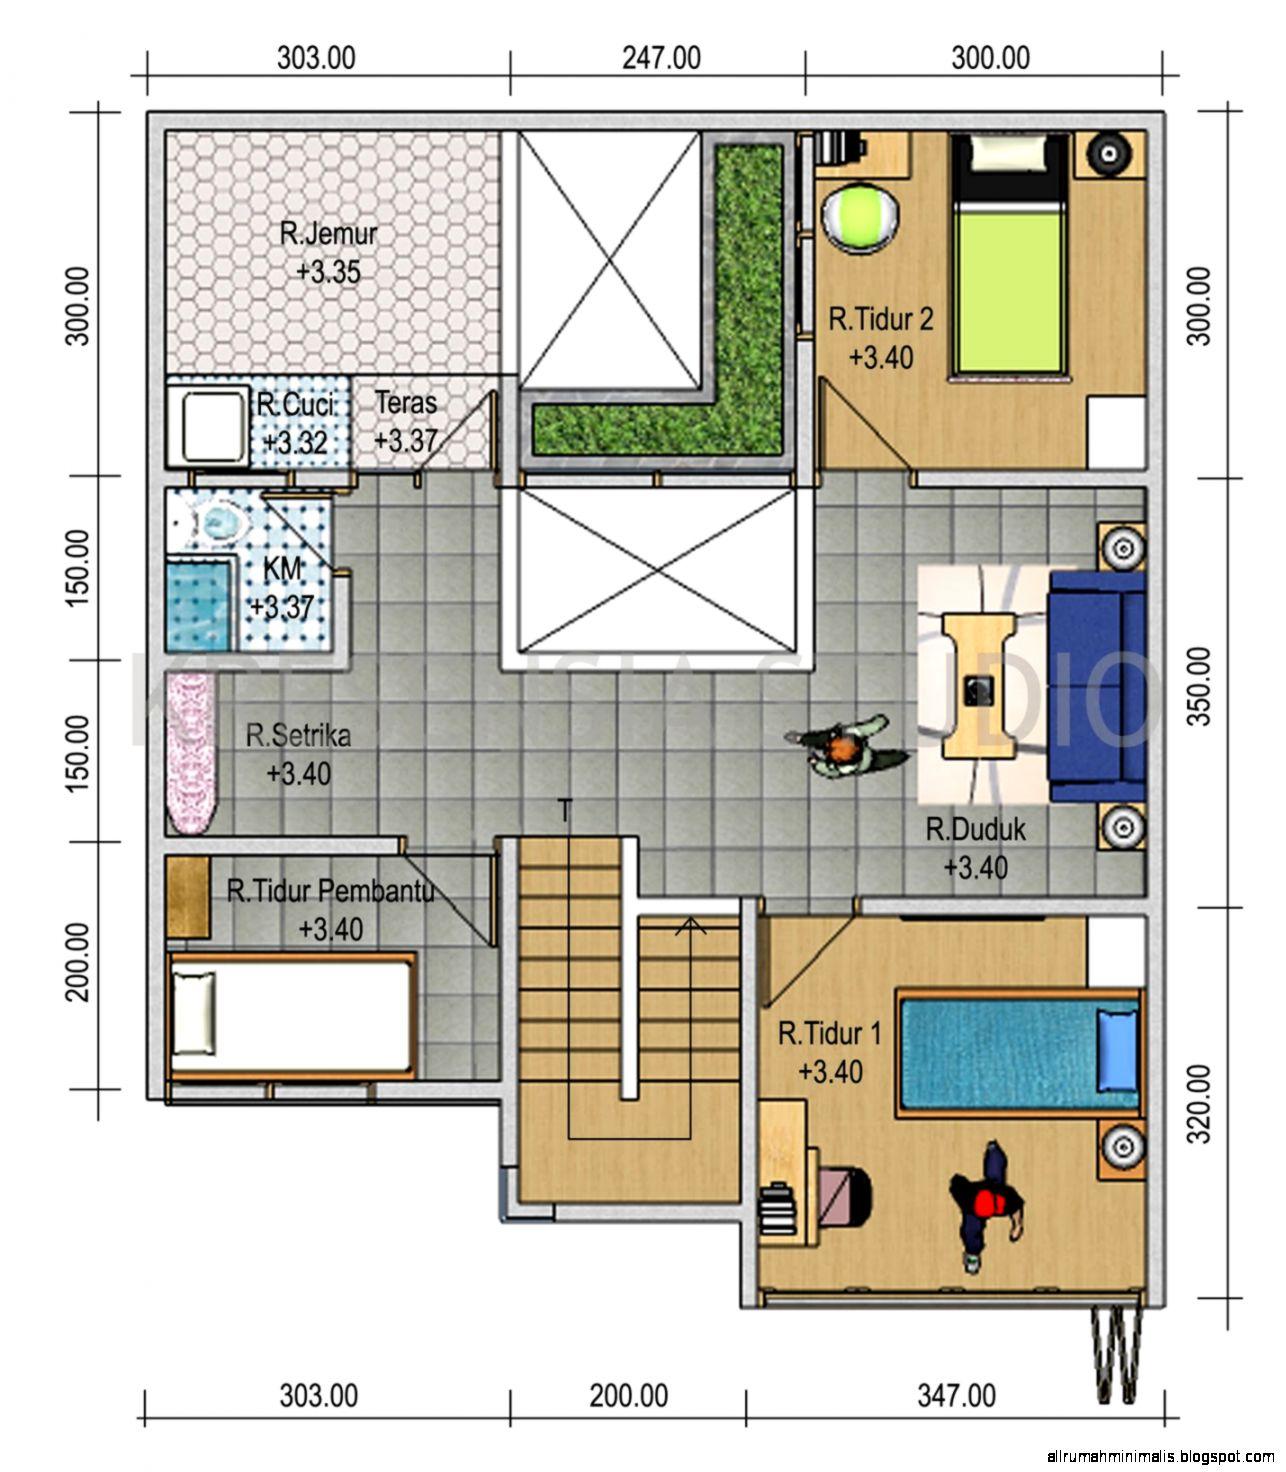 Gambar Contoh Sketsa Denah Rumah Minimalis Modern 2014  Trend 2015